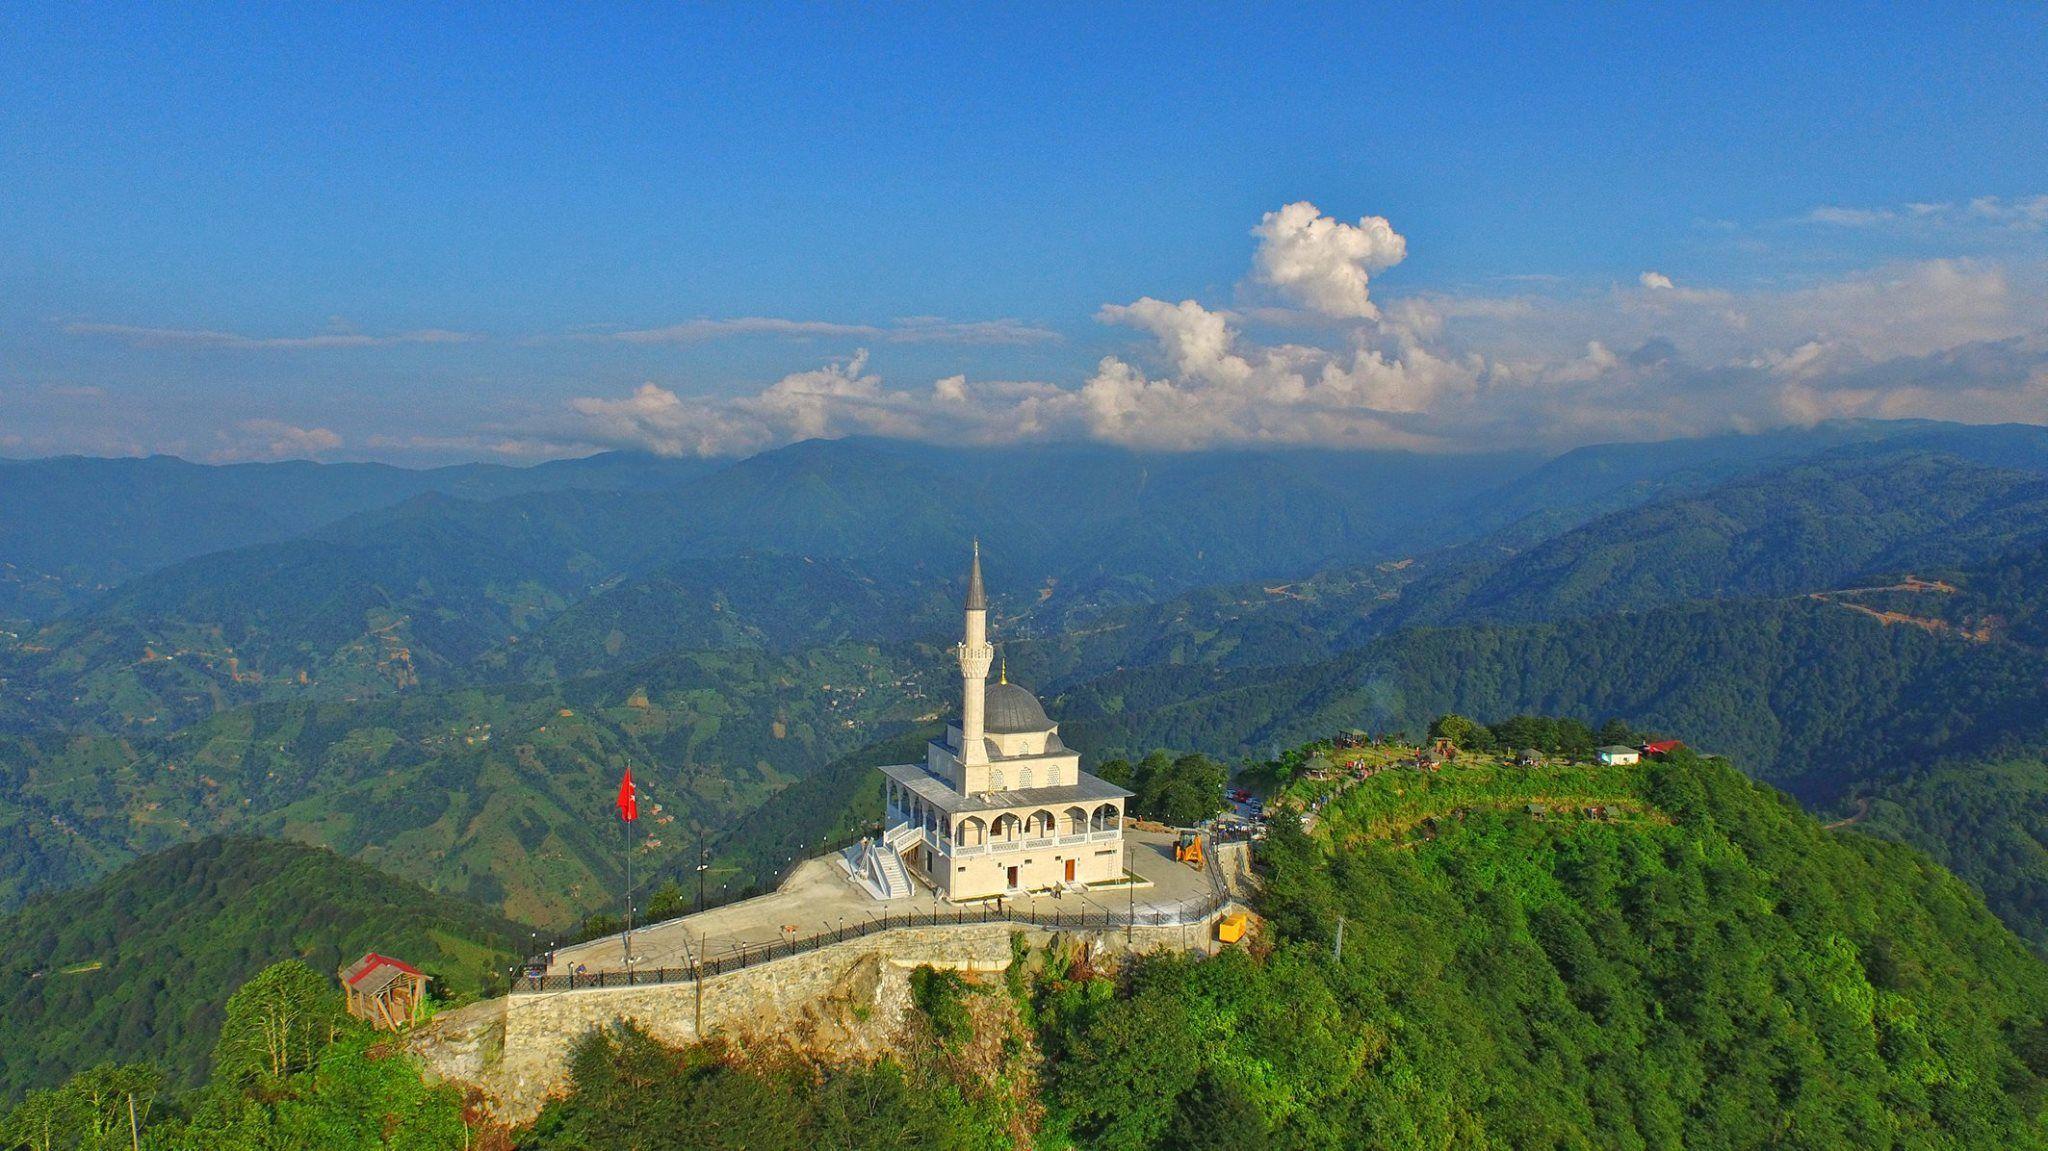 Kıble Mountain, Güneysu, Rize ⛵ Eastern Blacksea Region of Turkey ⚓ Östliche Schwarzmeerregion der Türkei #karadeniz #doğukaradeniz #rize #travel #city #nature #landscape #mosque #islam #ecotourism #tzaniti